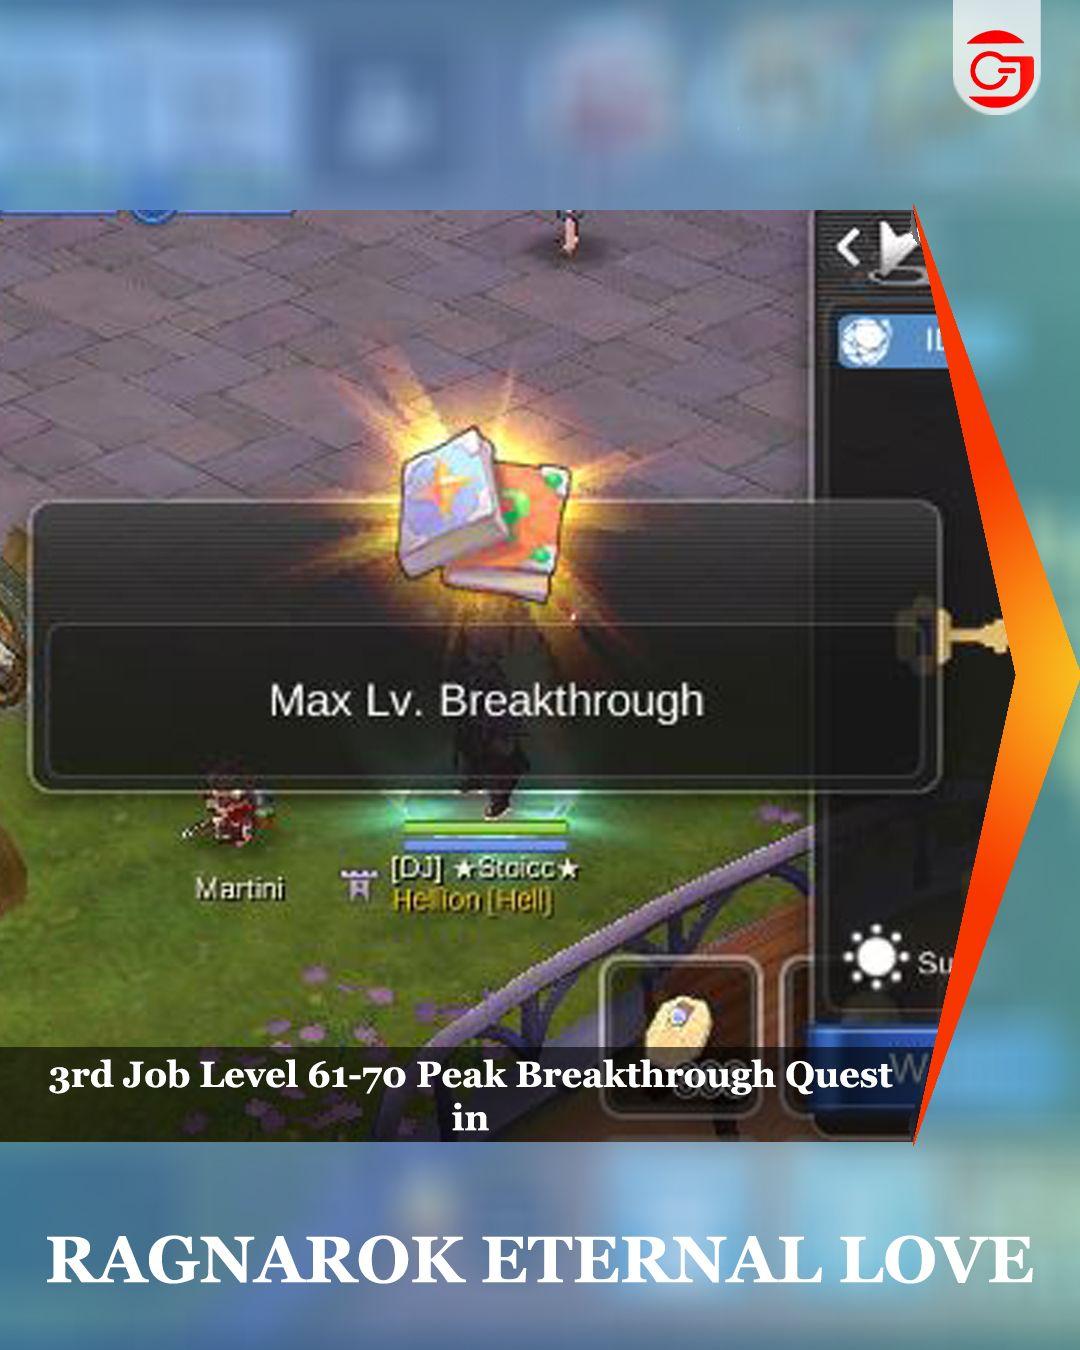 3rd Job Level 61 70 Peak Breakthrough Quest In Ragnarok Mobile Follow Us Gamerstopia Tv On Instagram Ragnarok Mobile Breakthrough Job